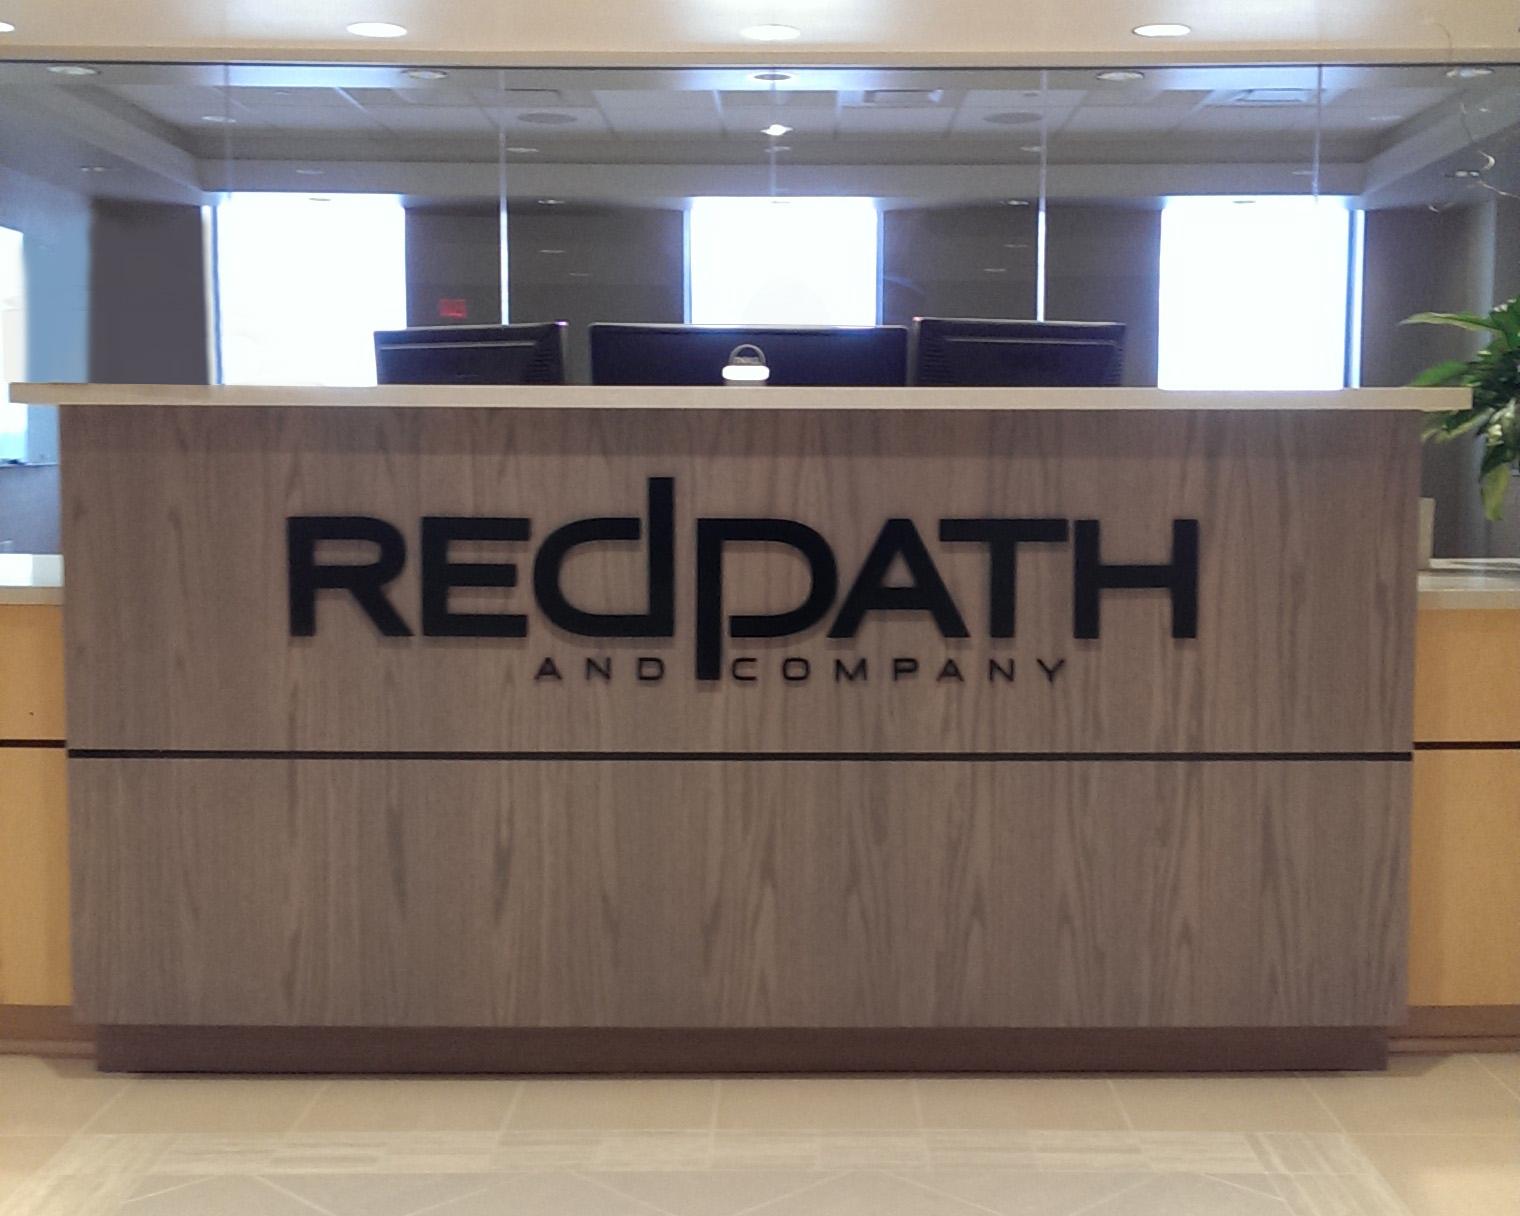 Redpath Interior Sign.jpg